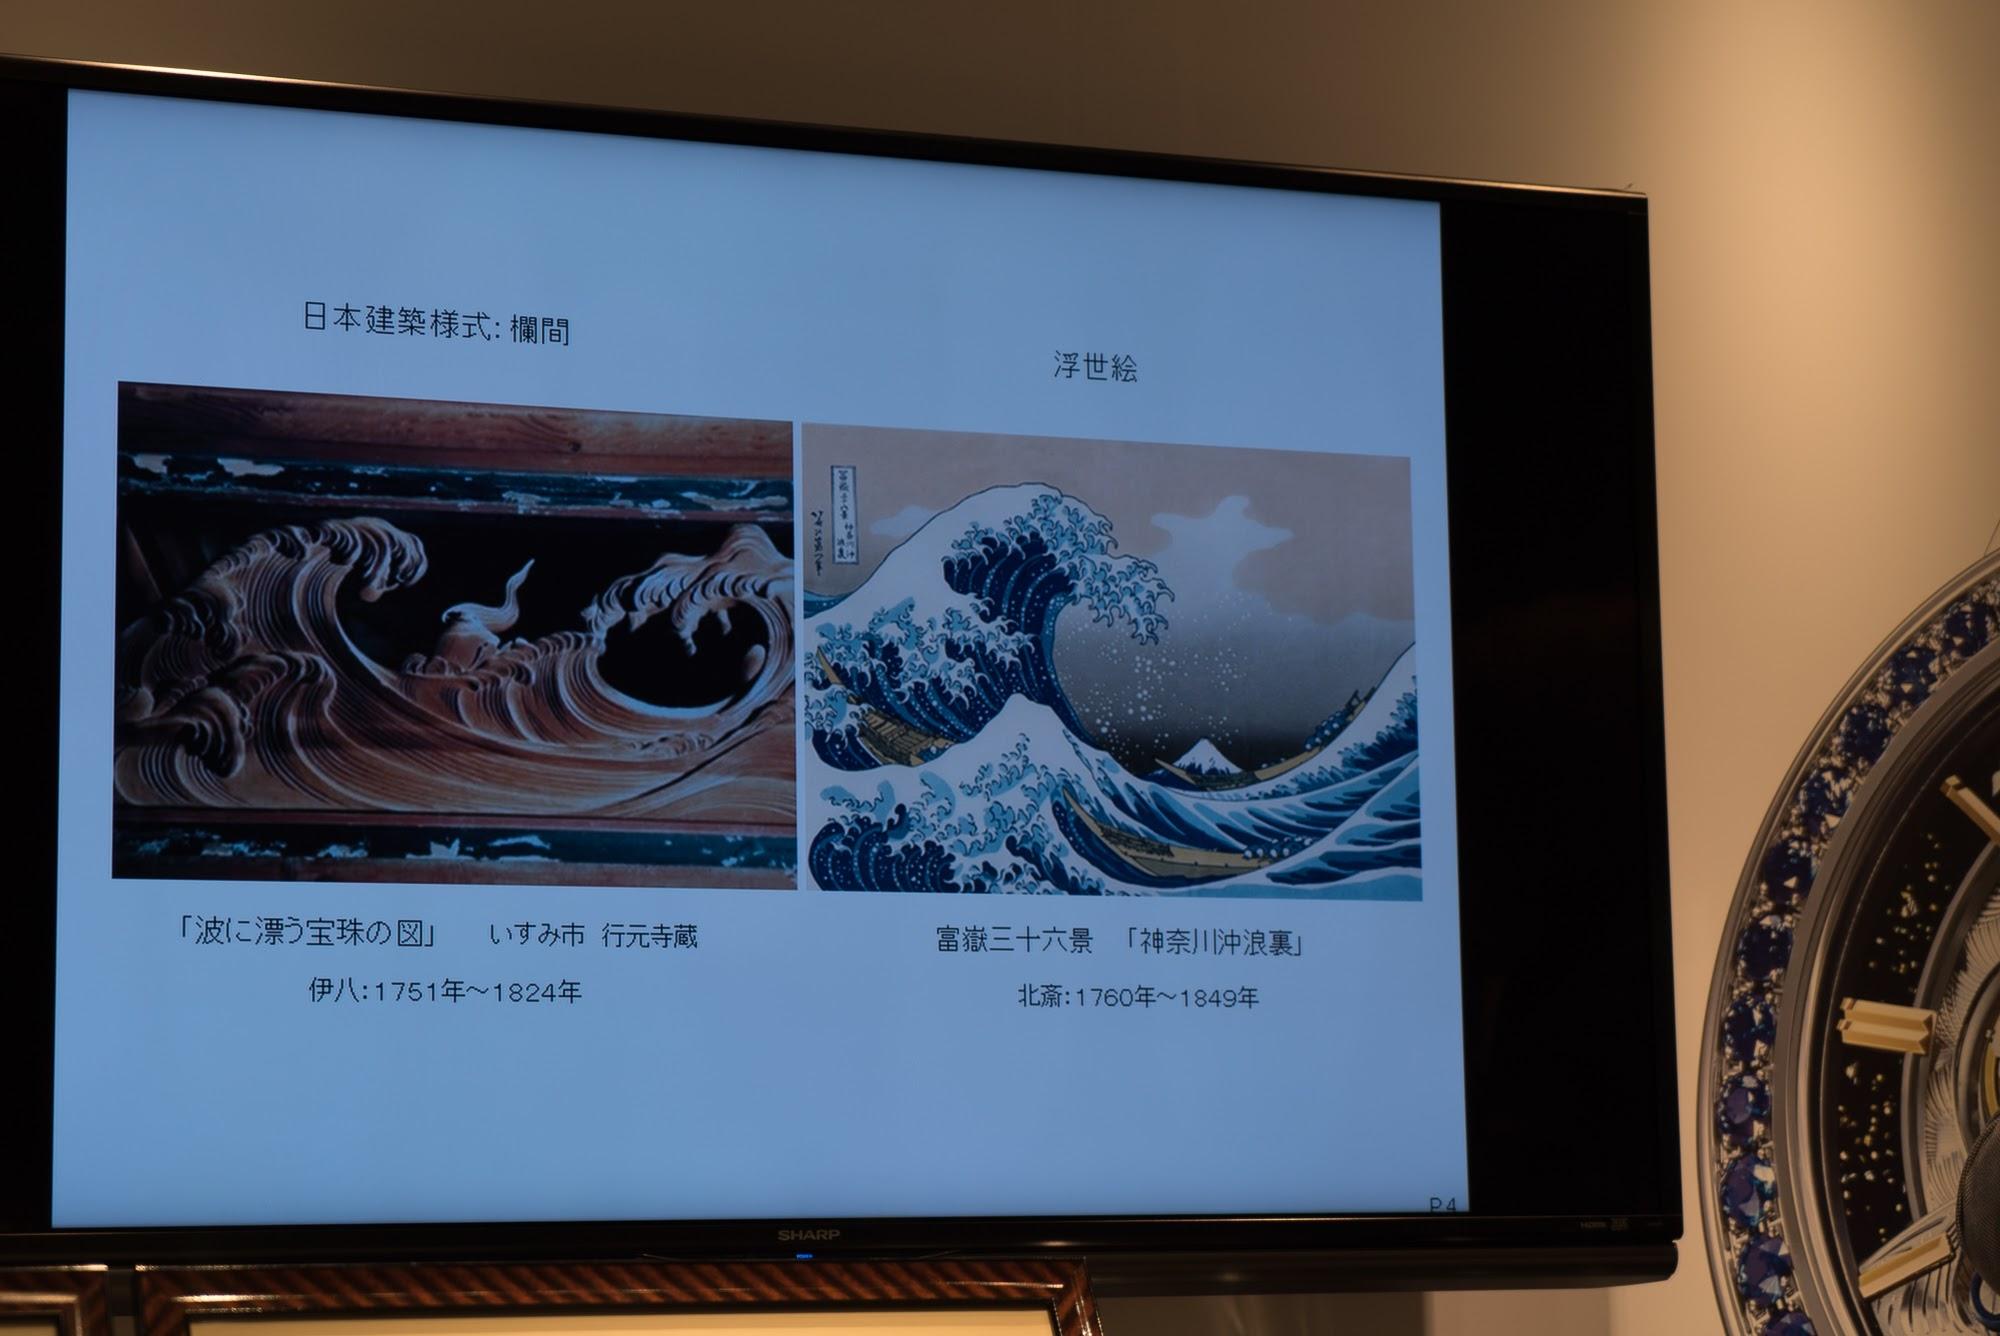 The Great Wave off Kanagawa inspiration